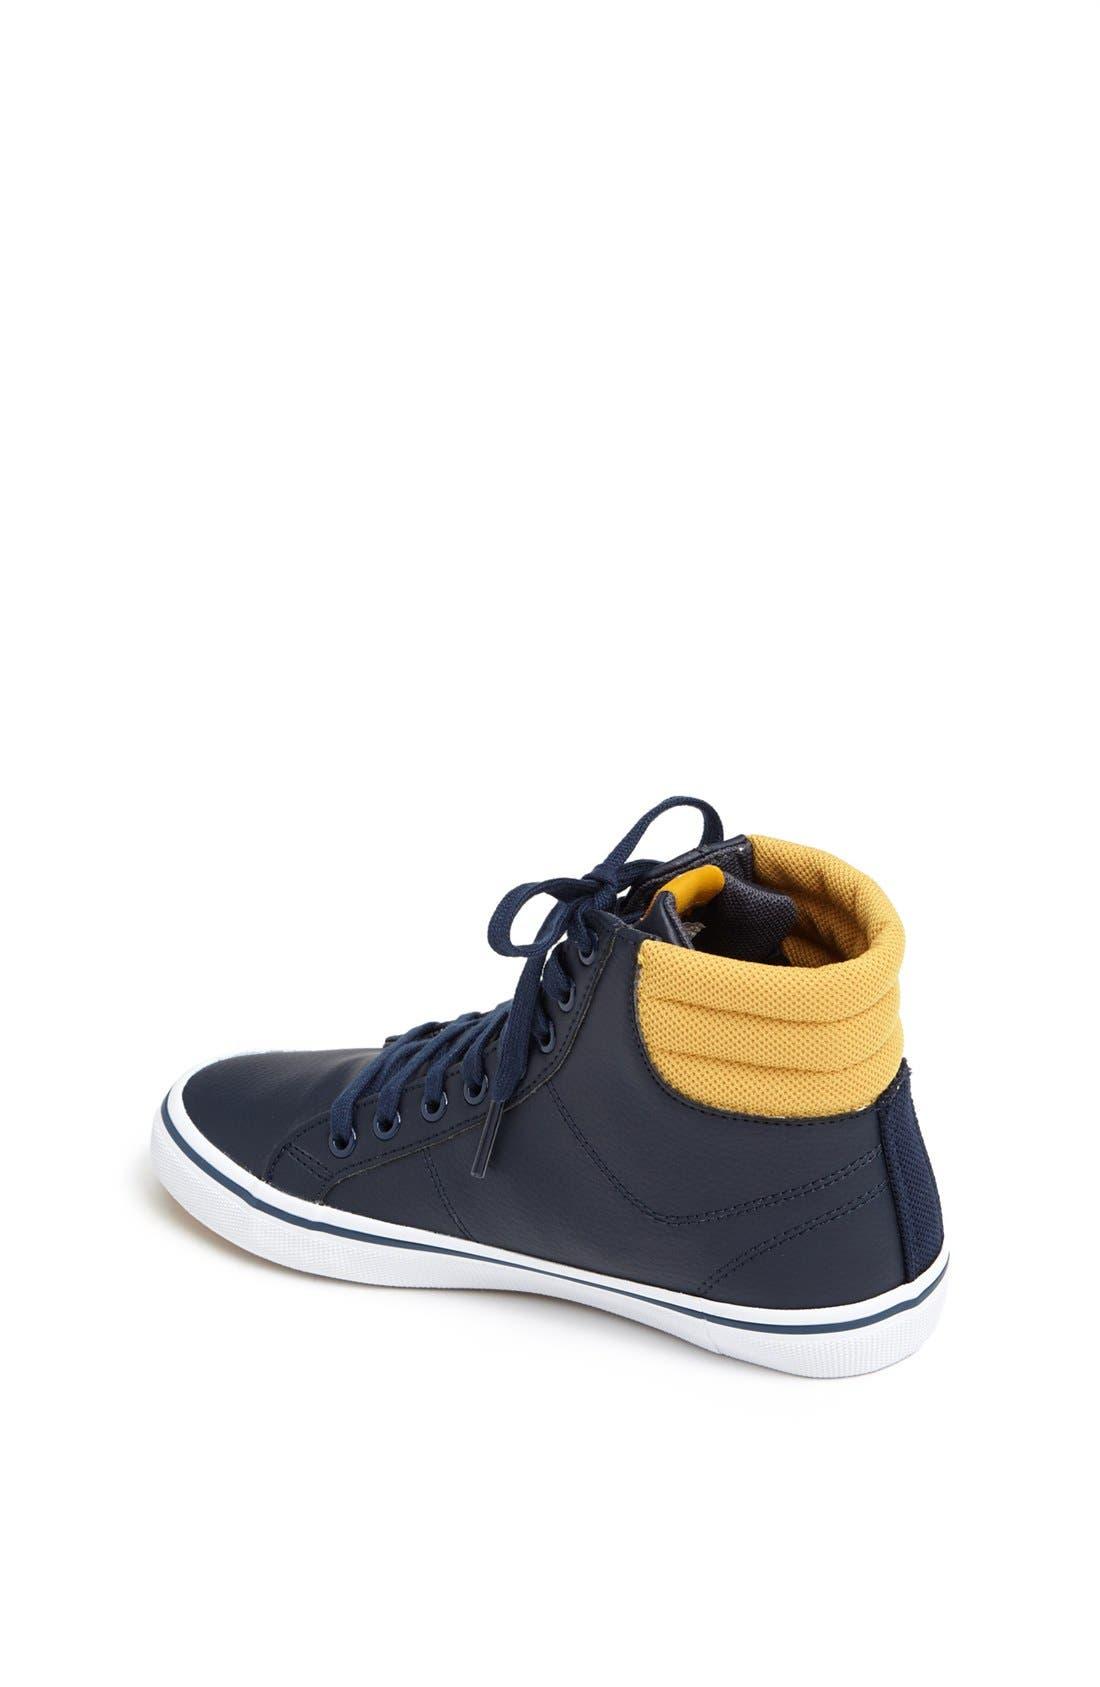 Alternate Image 2  - Lacoste 'Marcel' Sneaker (Baby, Walker, Toddler, Little Kid & Big Kid)